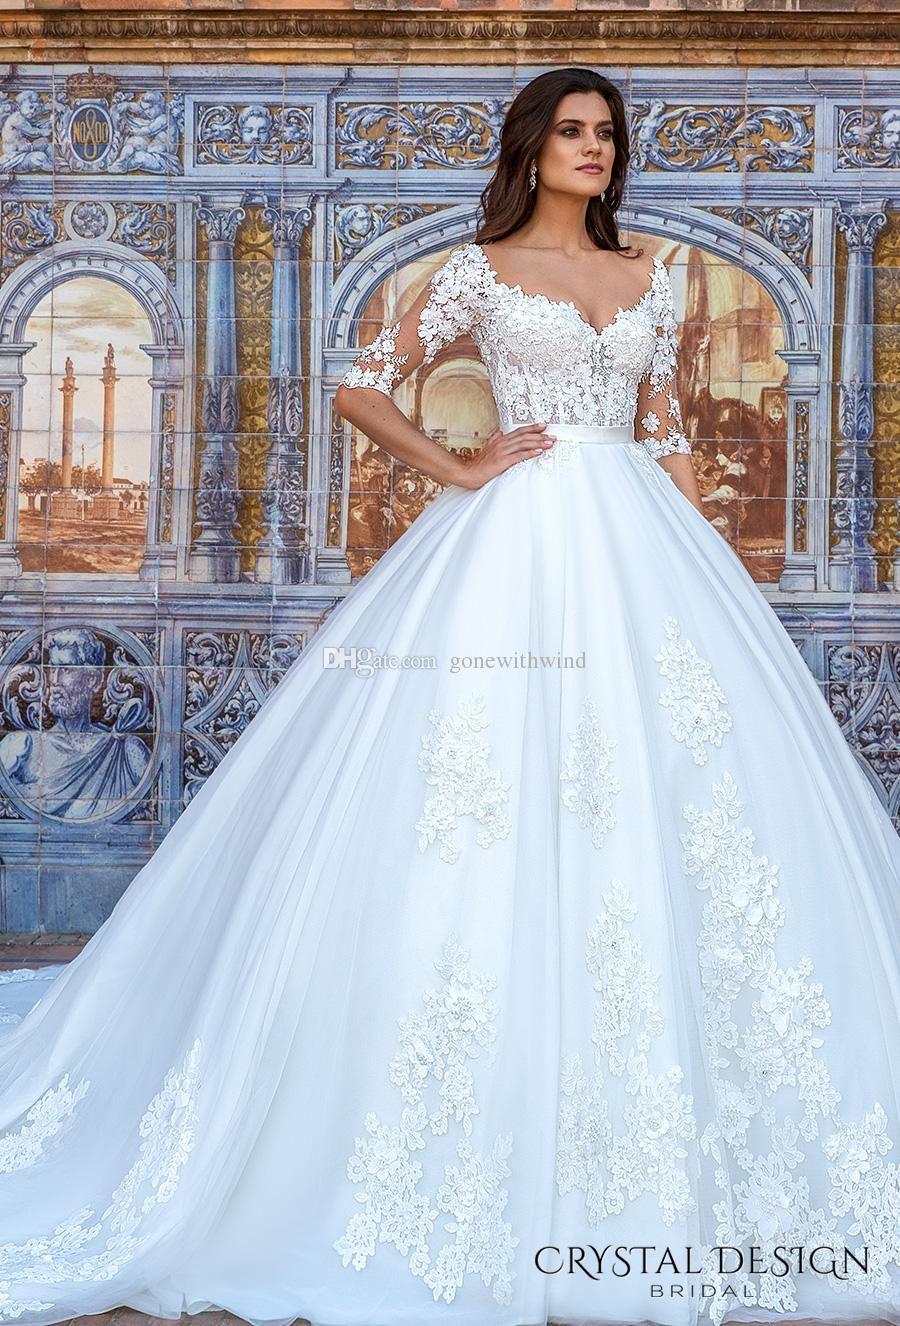 Princess Ball Gown Royal Train Wedding Dresses 2017